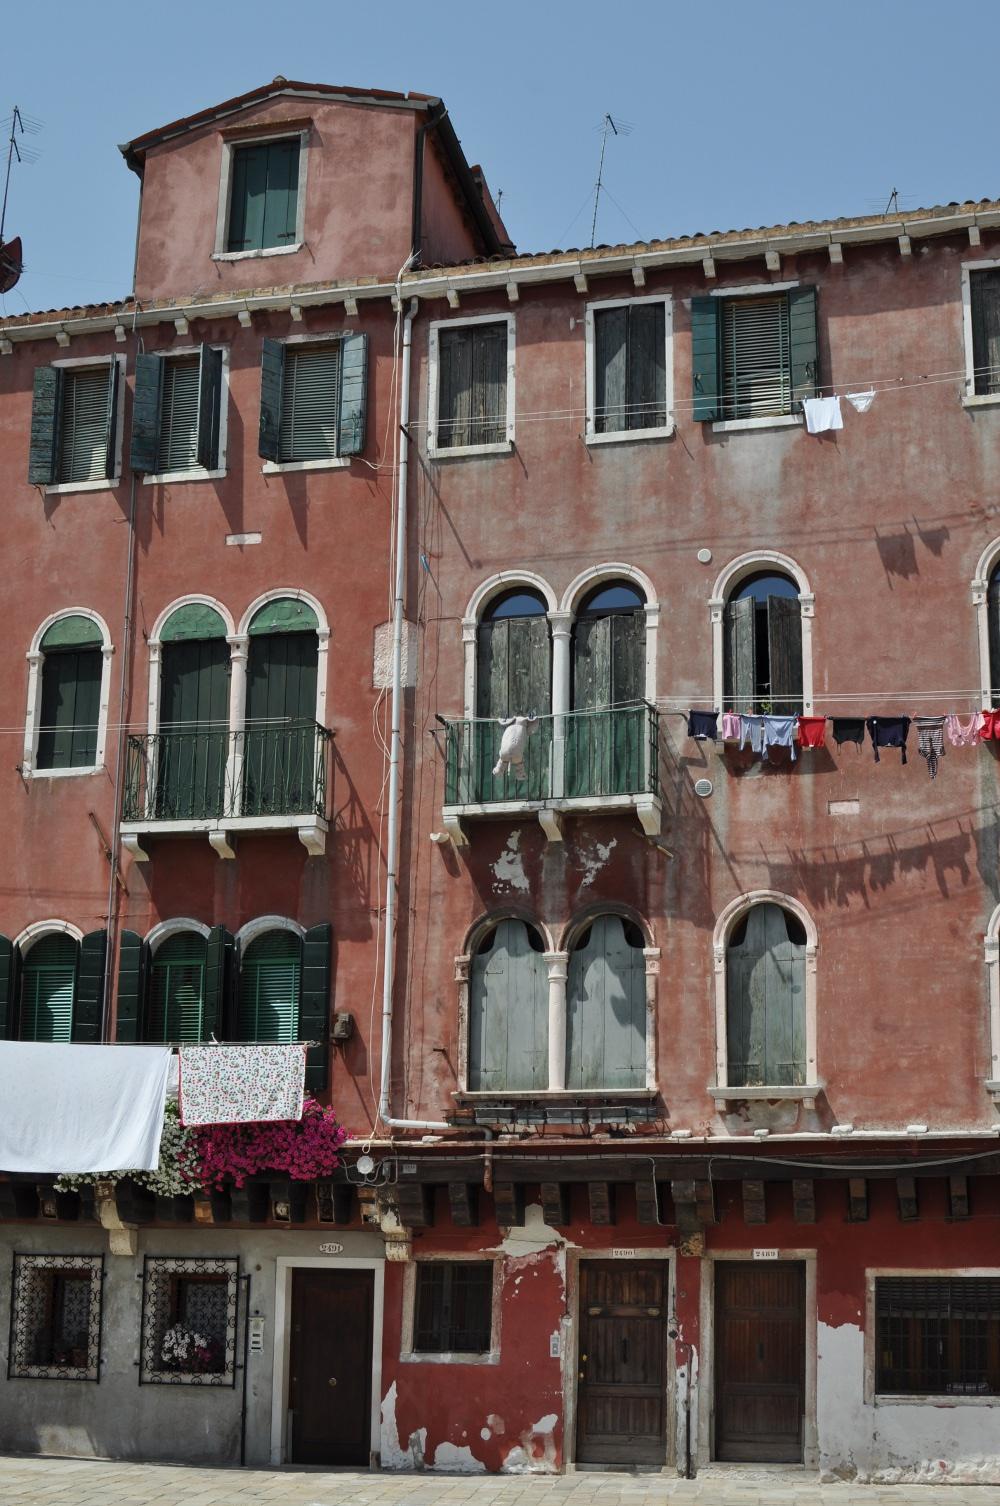 rocaille-blog-venezia-redentore (12)